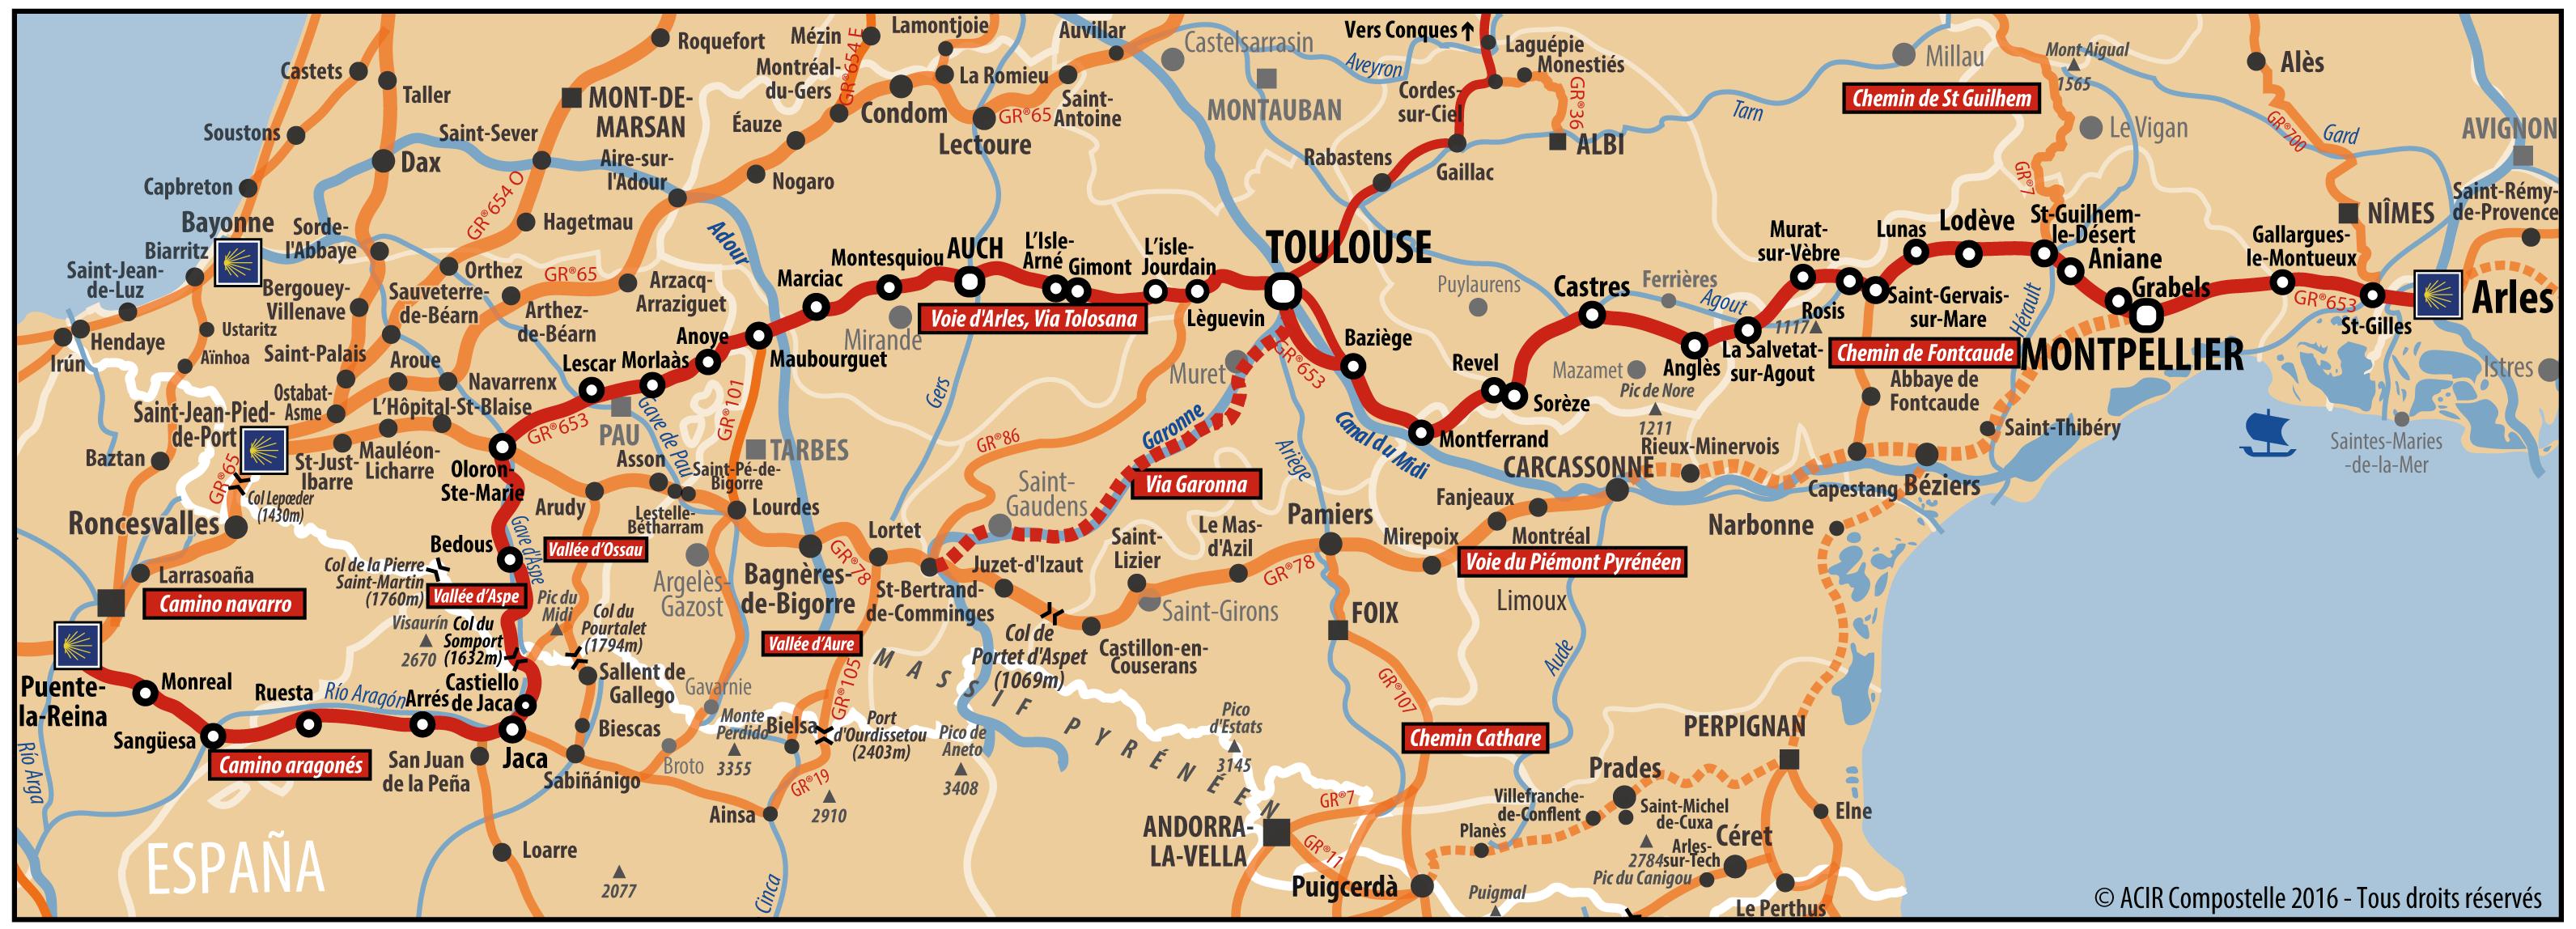 carte voie Arles-01